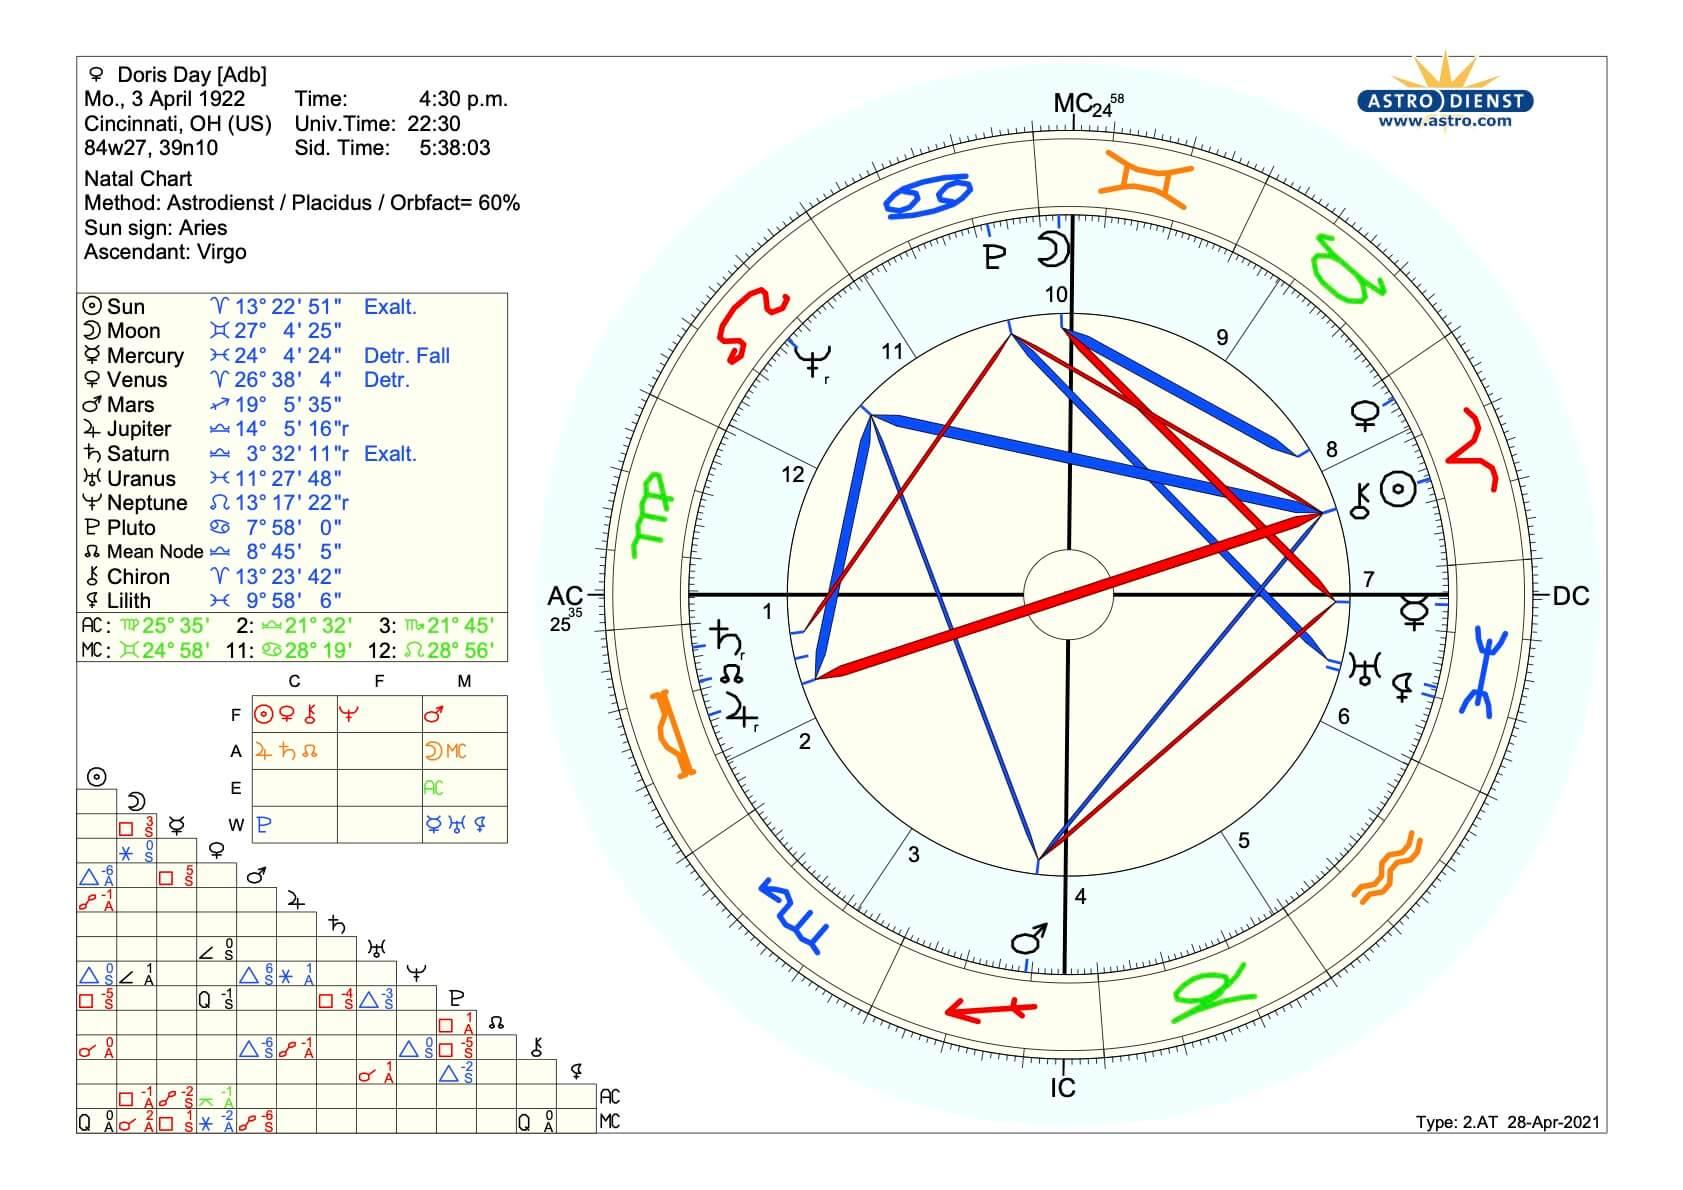 Horoskop_Doris_Day_Martin_Sebastian_Moritz_Psychologische_Astrologie_Berlin_Hamburg